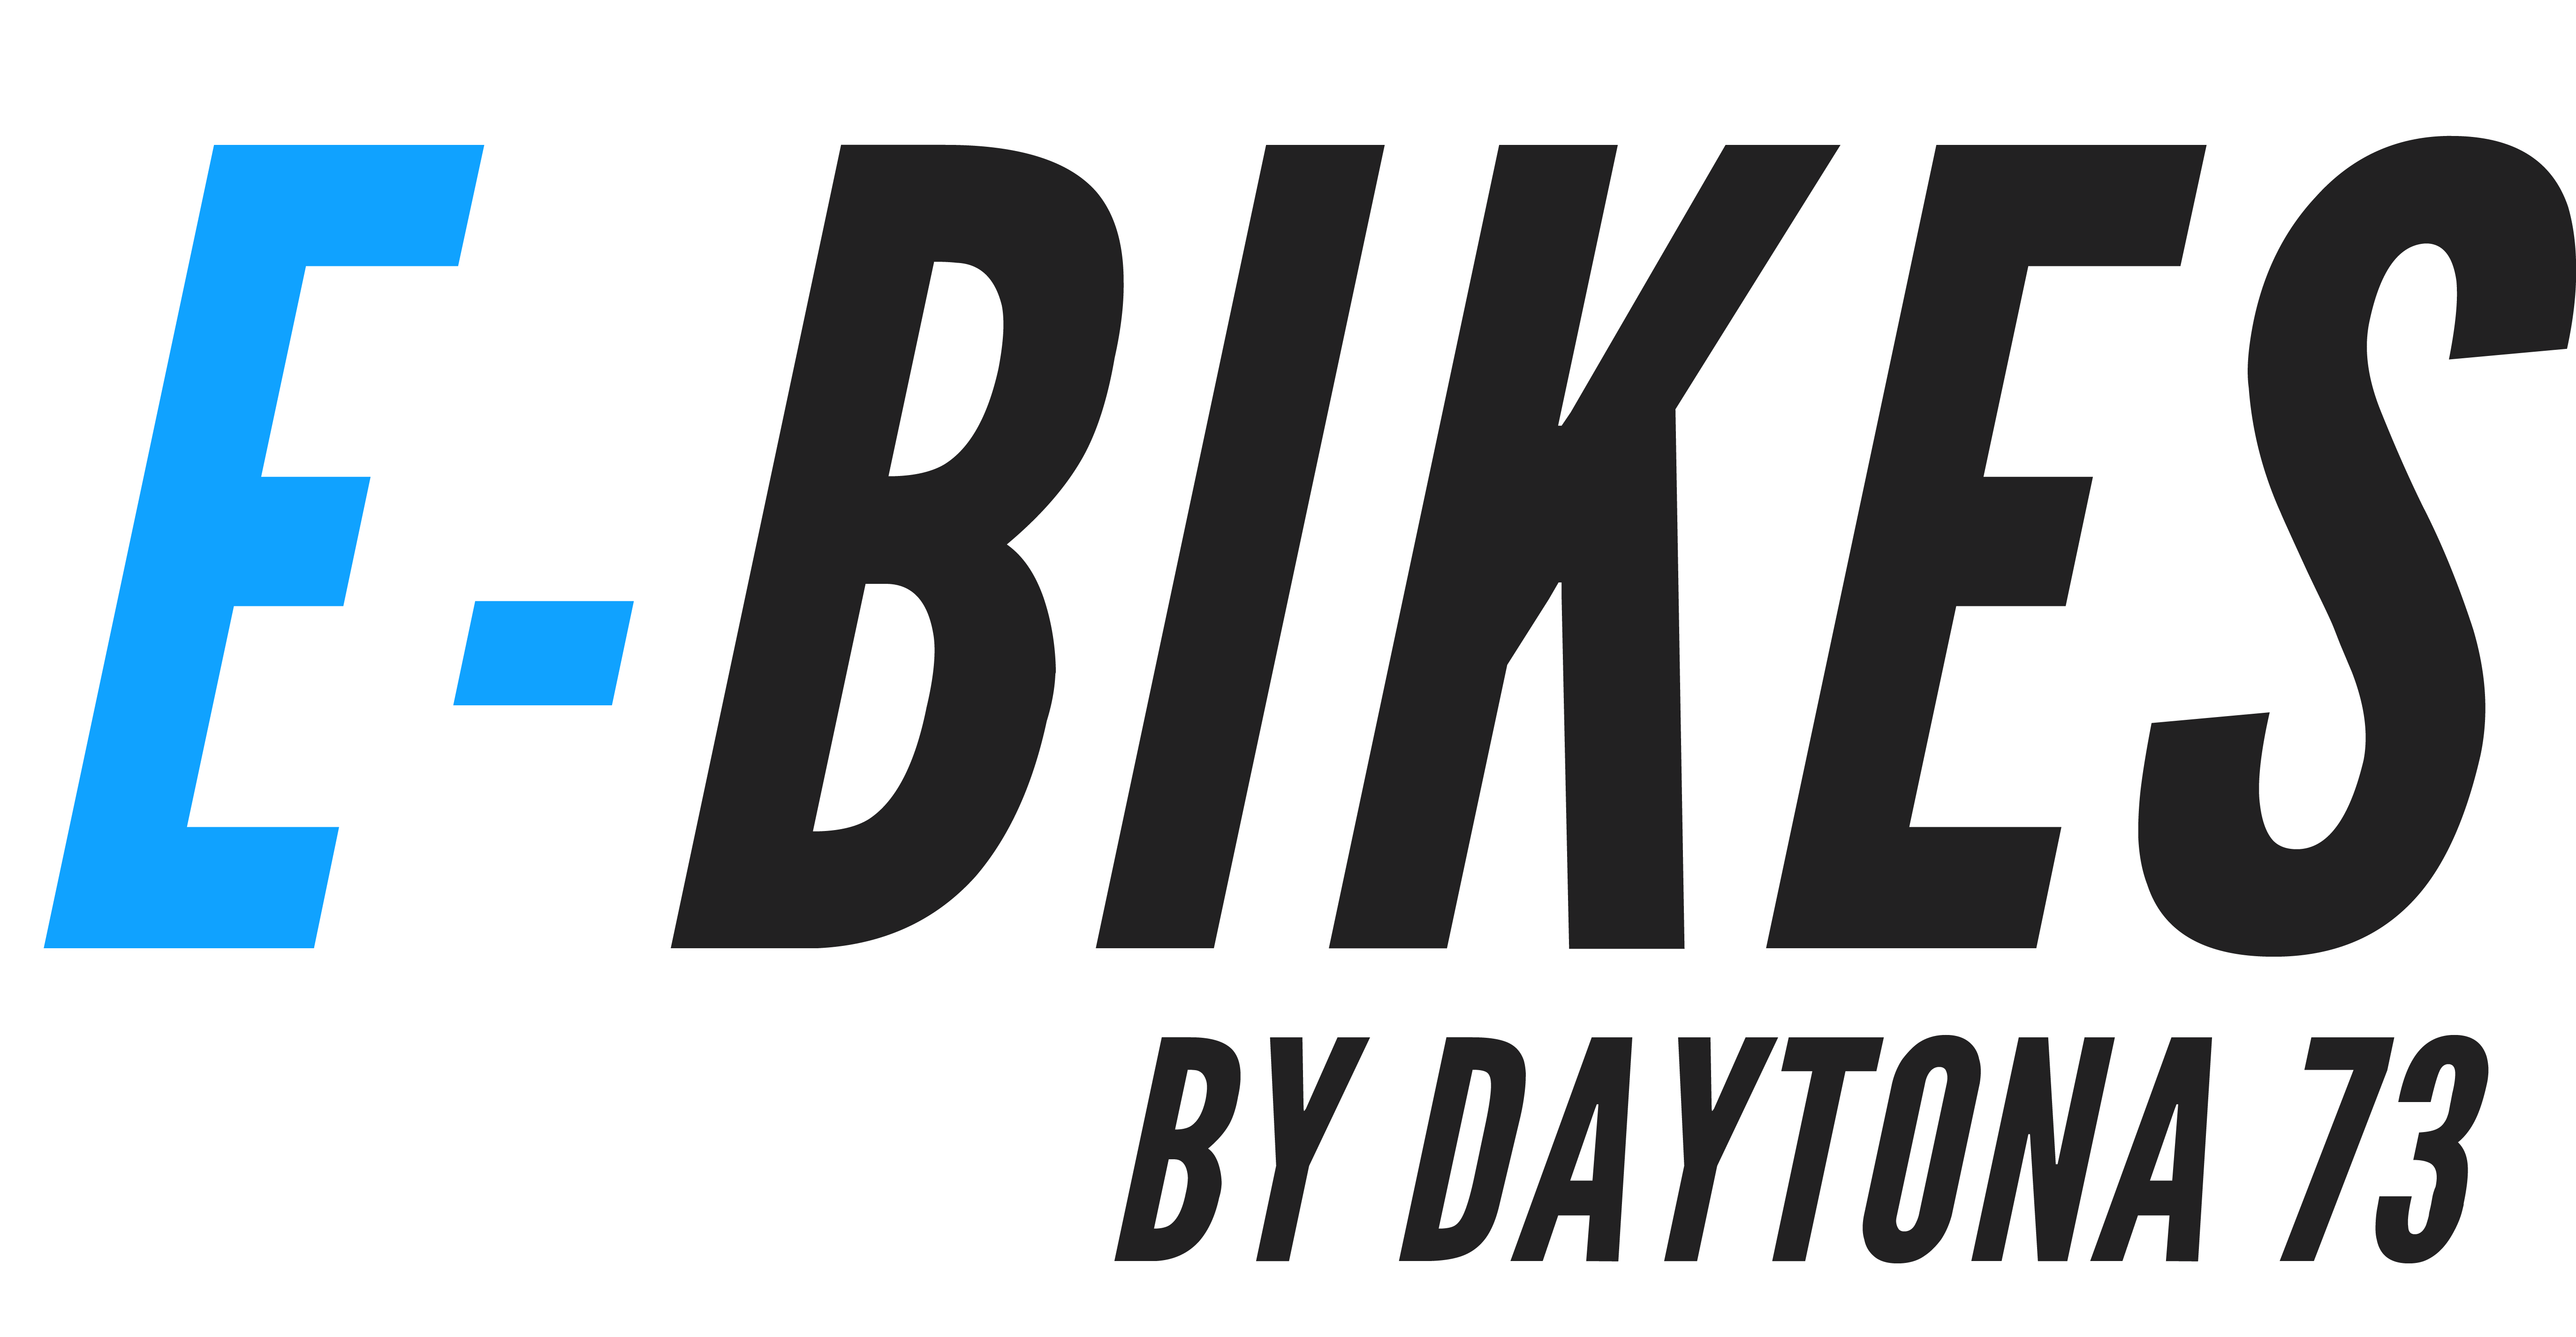 Logo e-bikes by Daytona 73